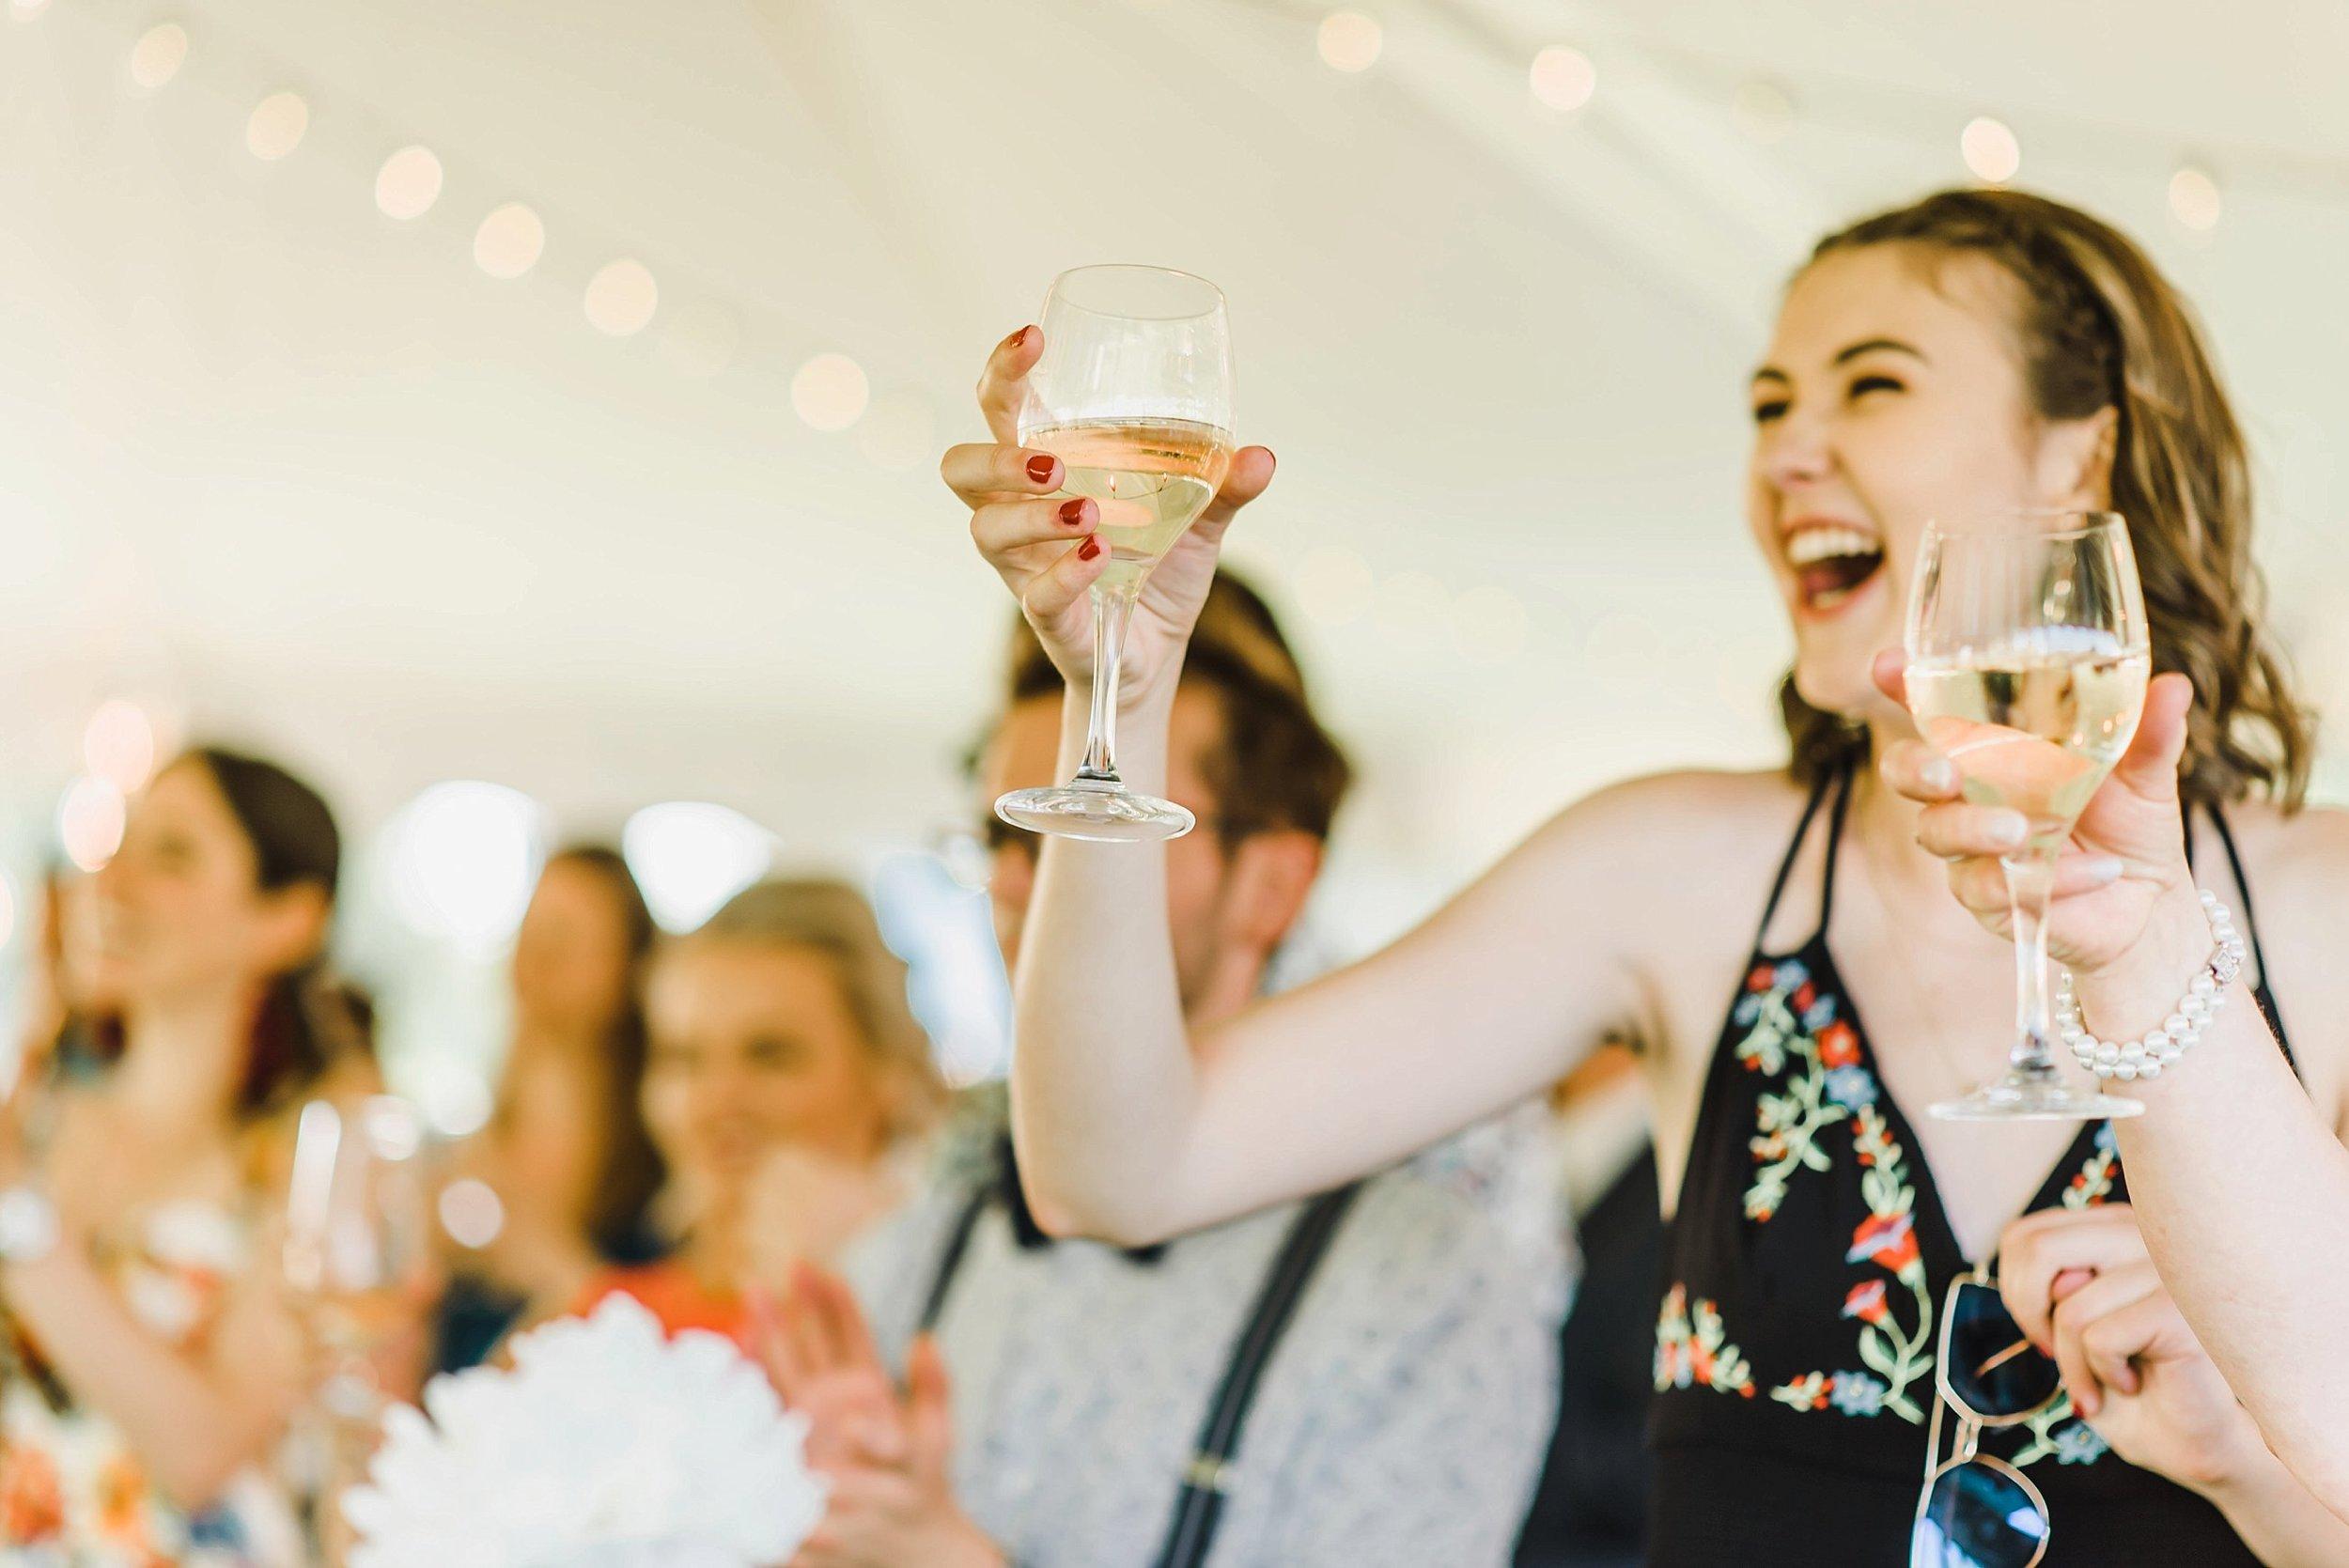 light airy indie fine art ottawa wedding photographer | Ali and Batoul Photography_0883.jpg